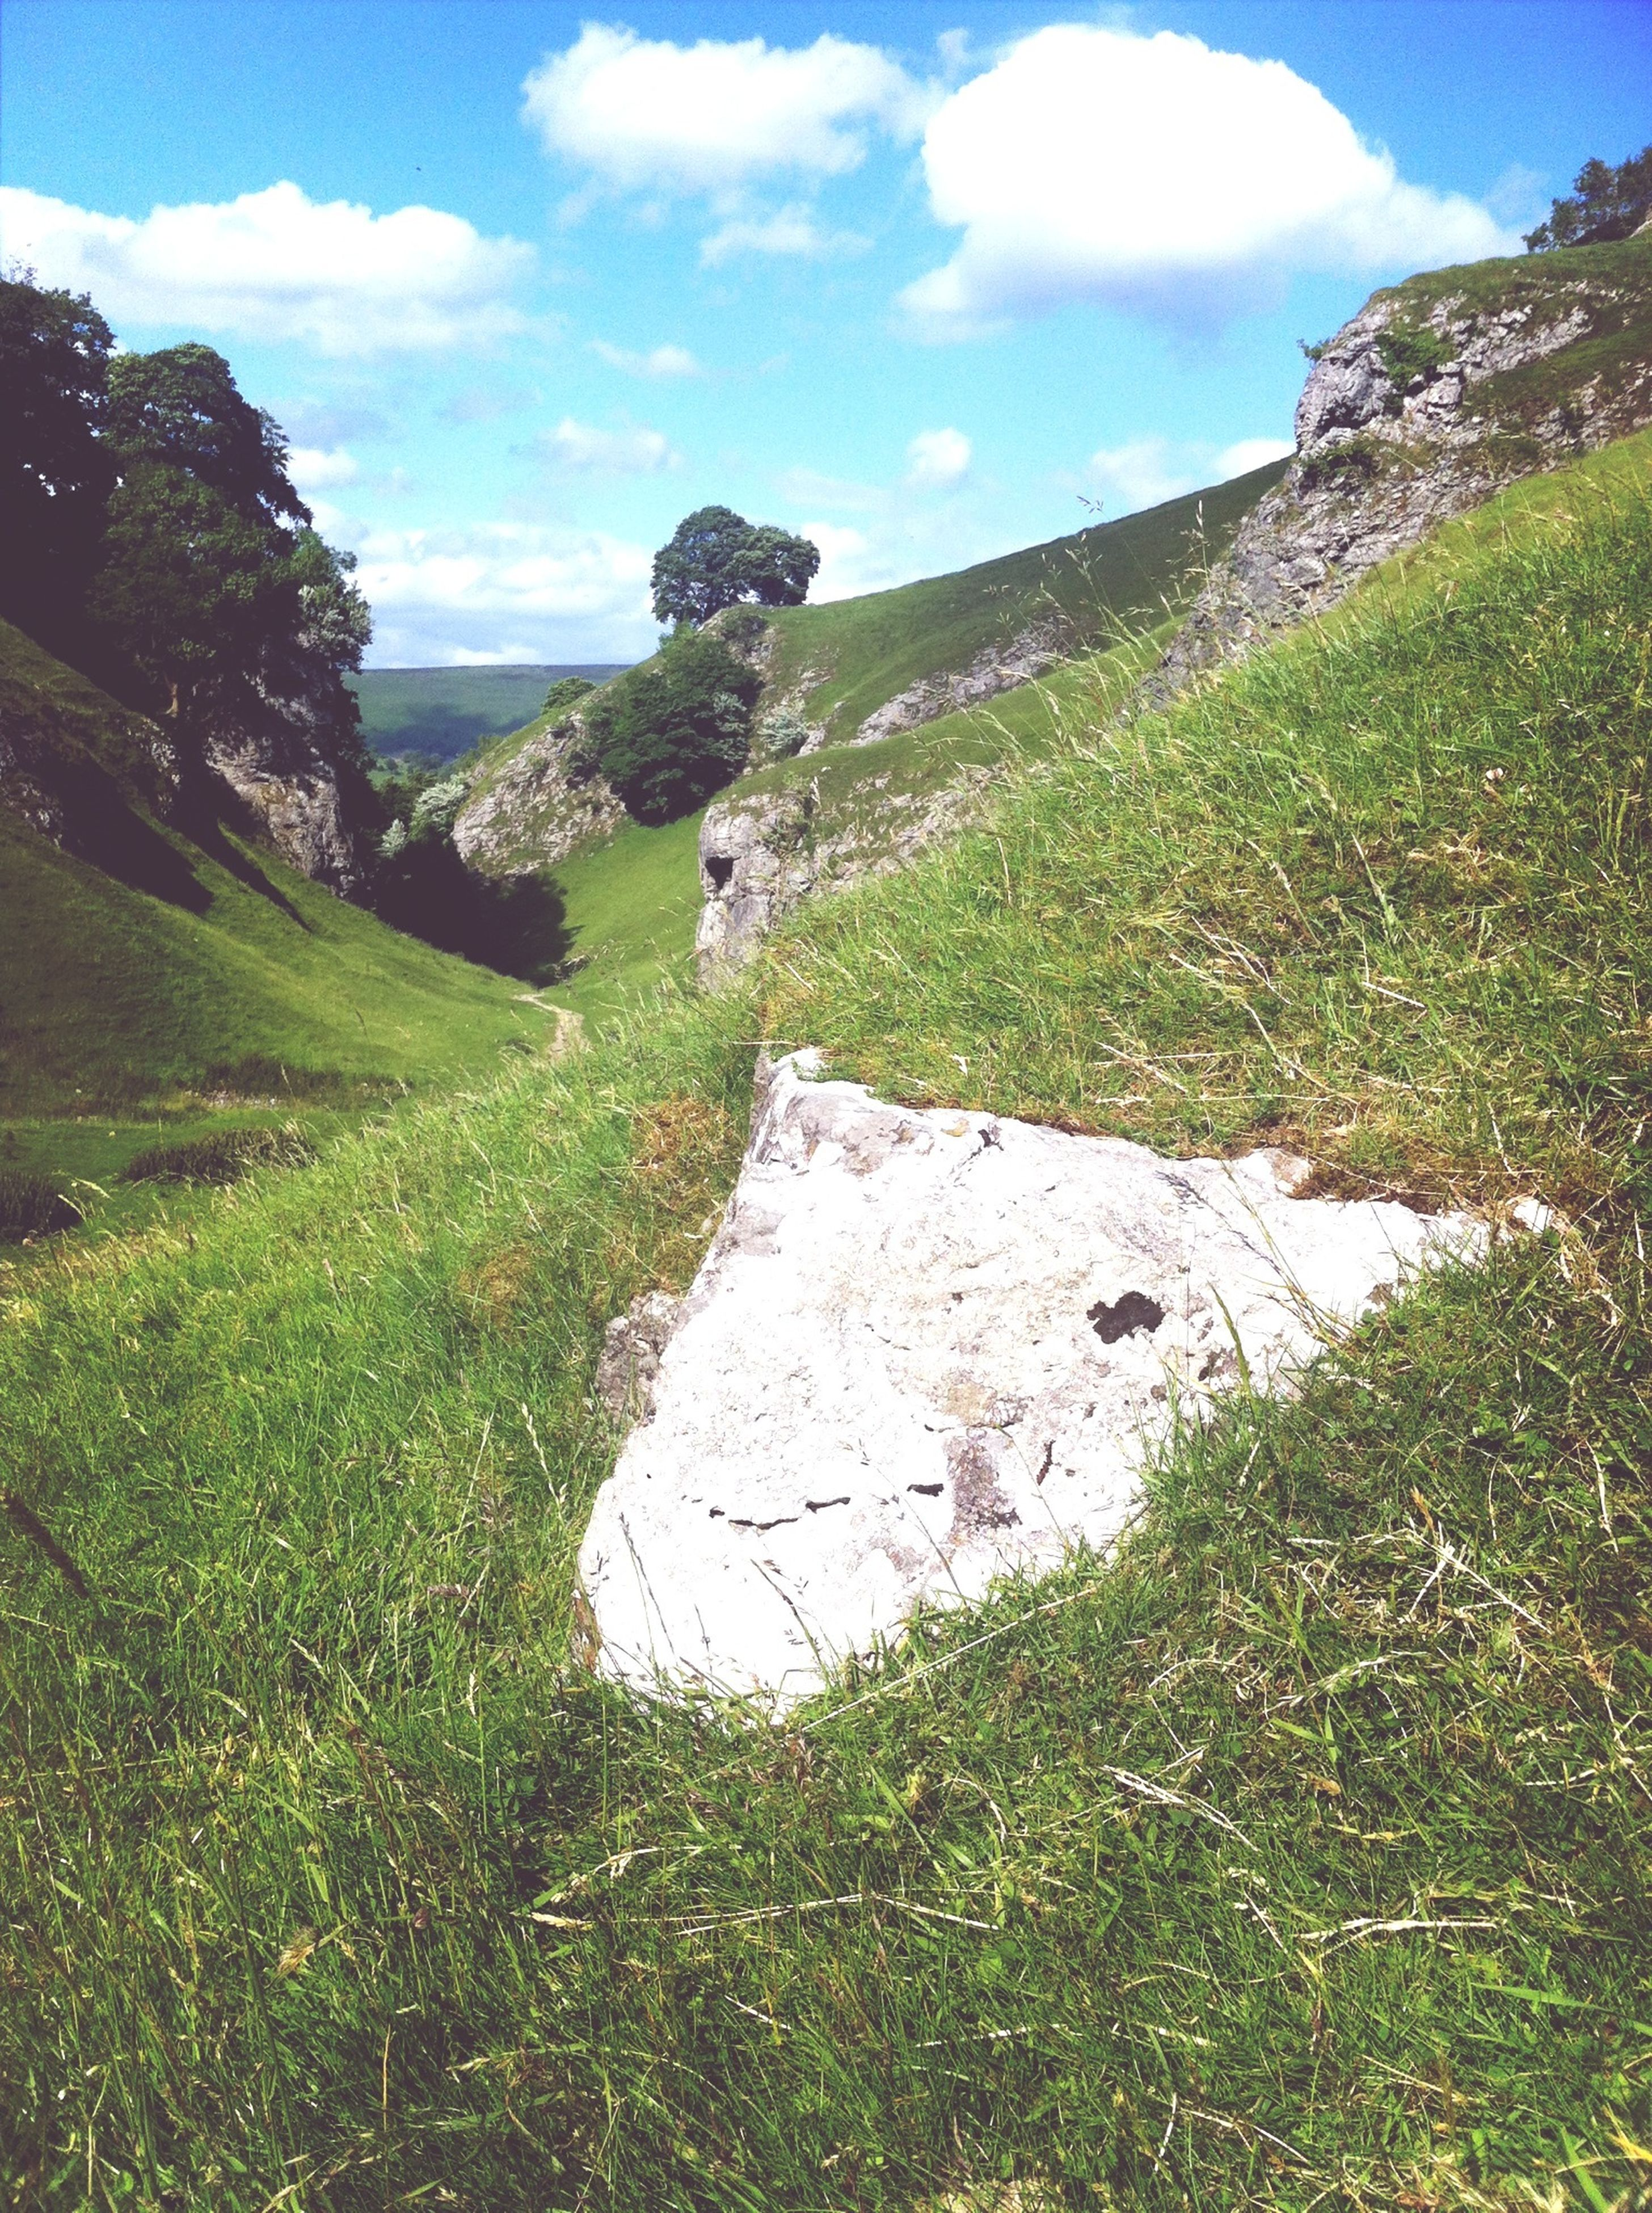 grass, sky, tranquility, tranquil scene, landscape, mountain, scenics, green color, nature, beauty in nature, cloud, grassy, non-urban scene, field, blue, plant, hill, tree, remote, sunlight